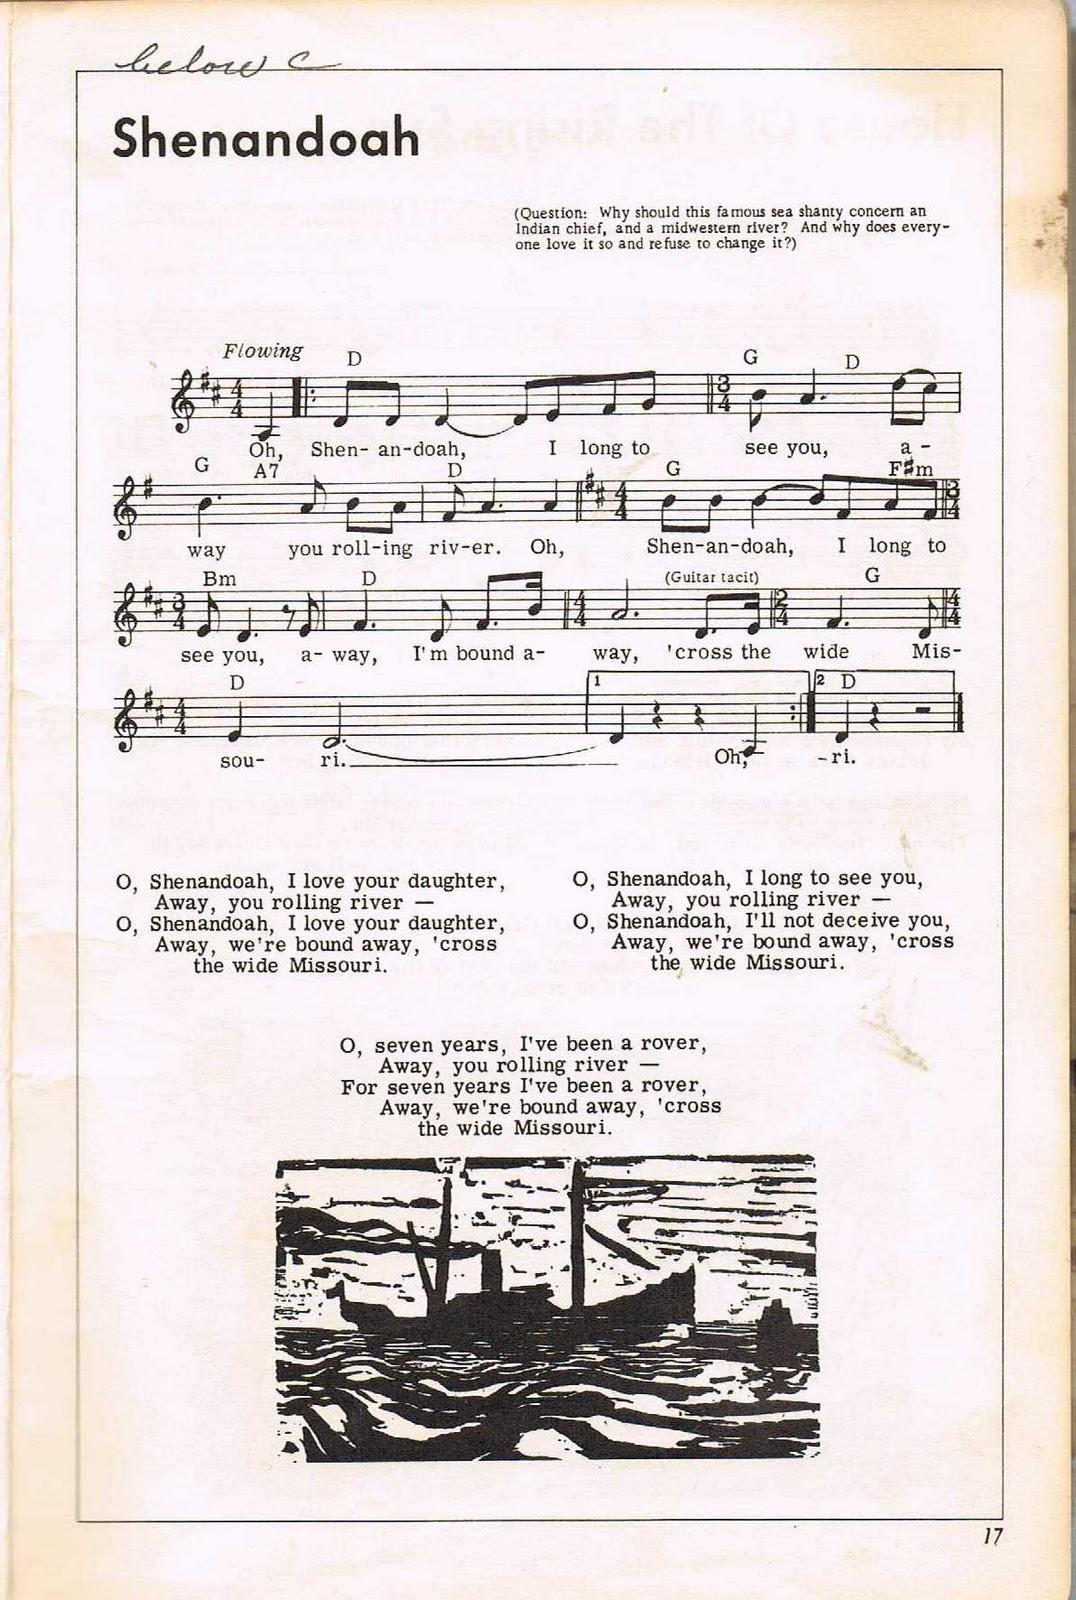 Betalegium: Shenandoah- Pete Seeger Songbook Notes and ...